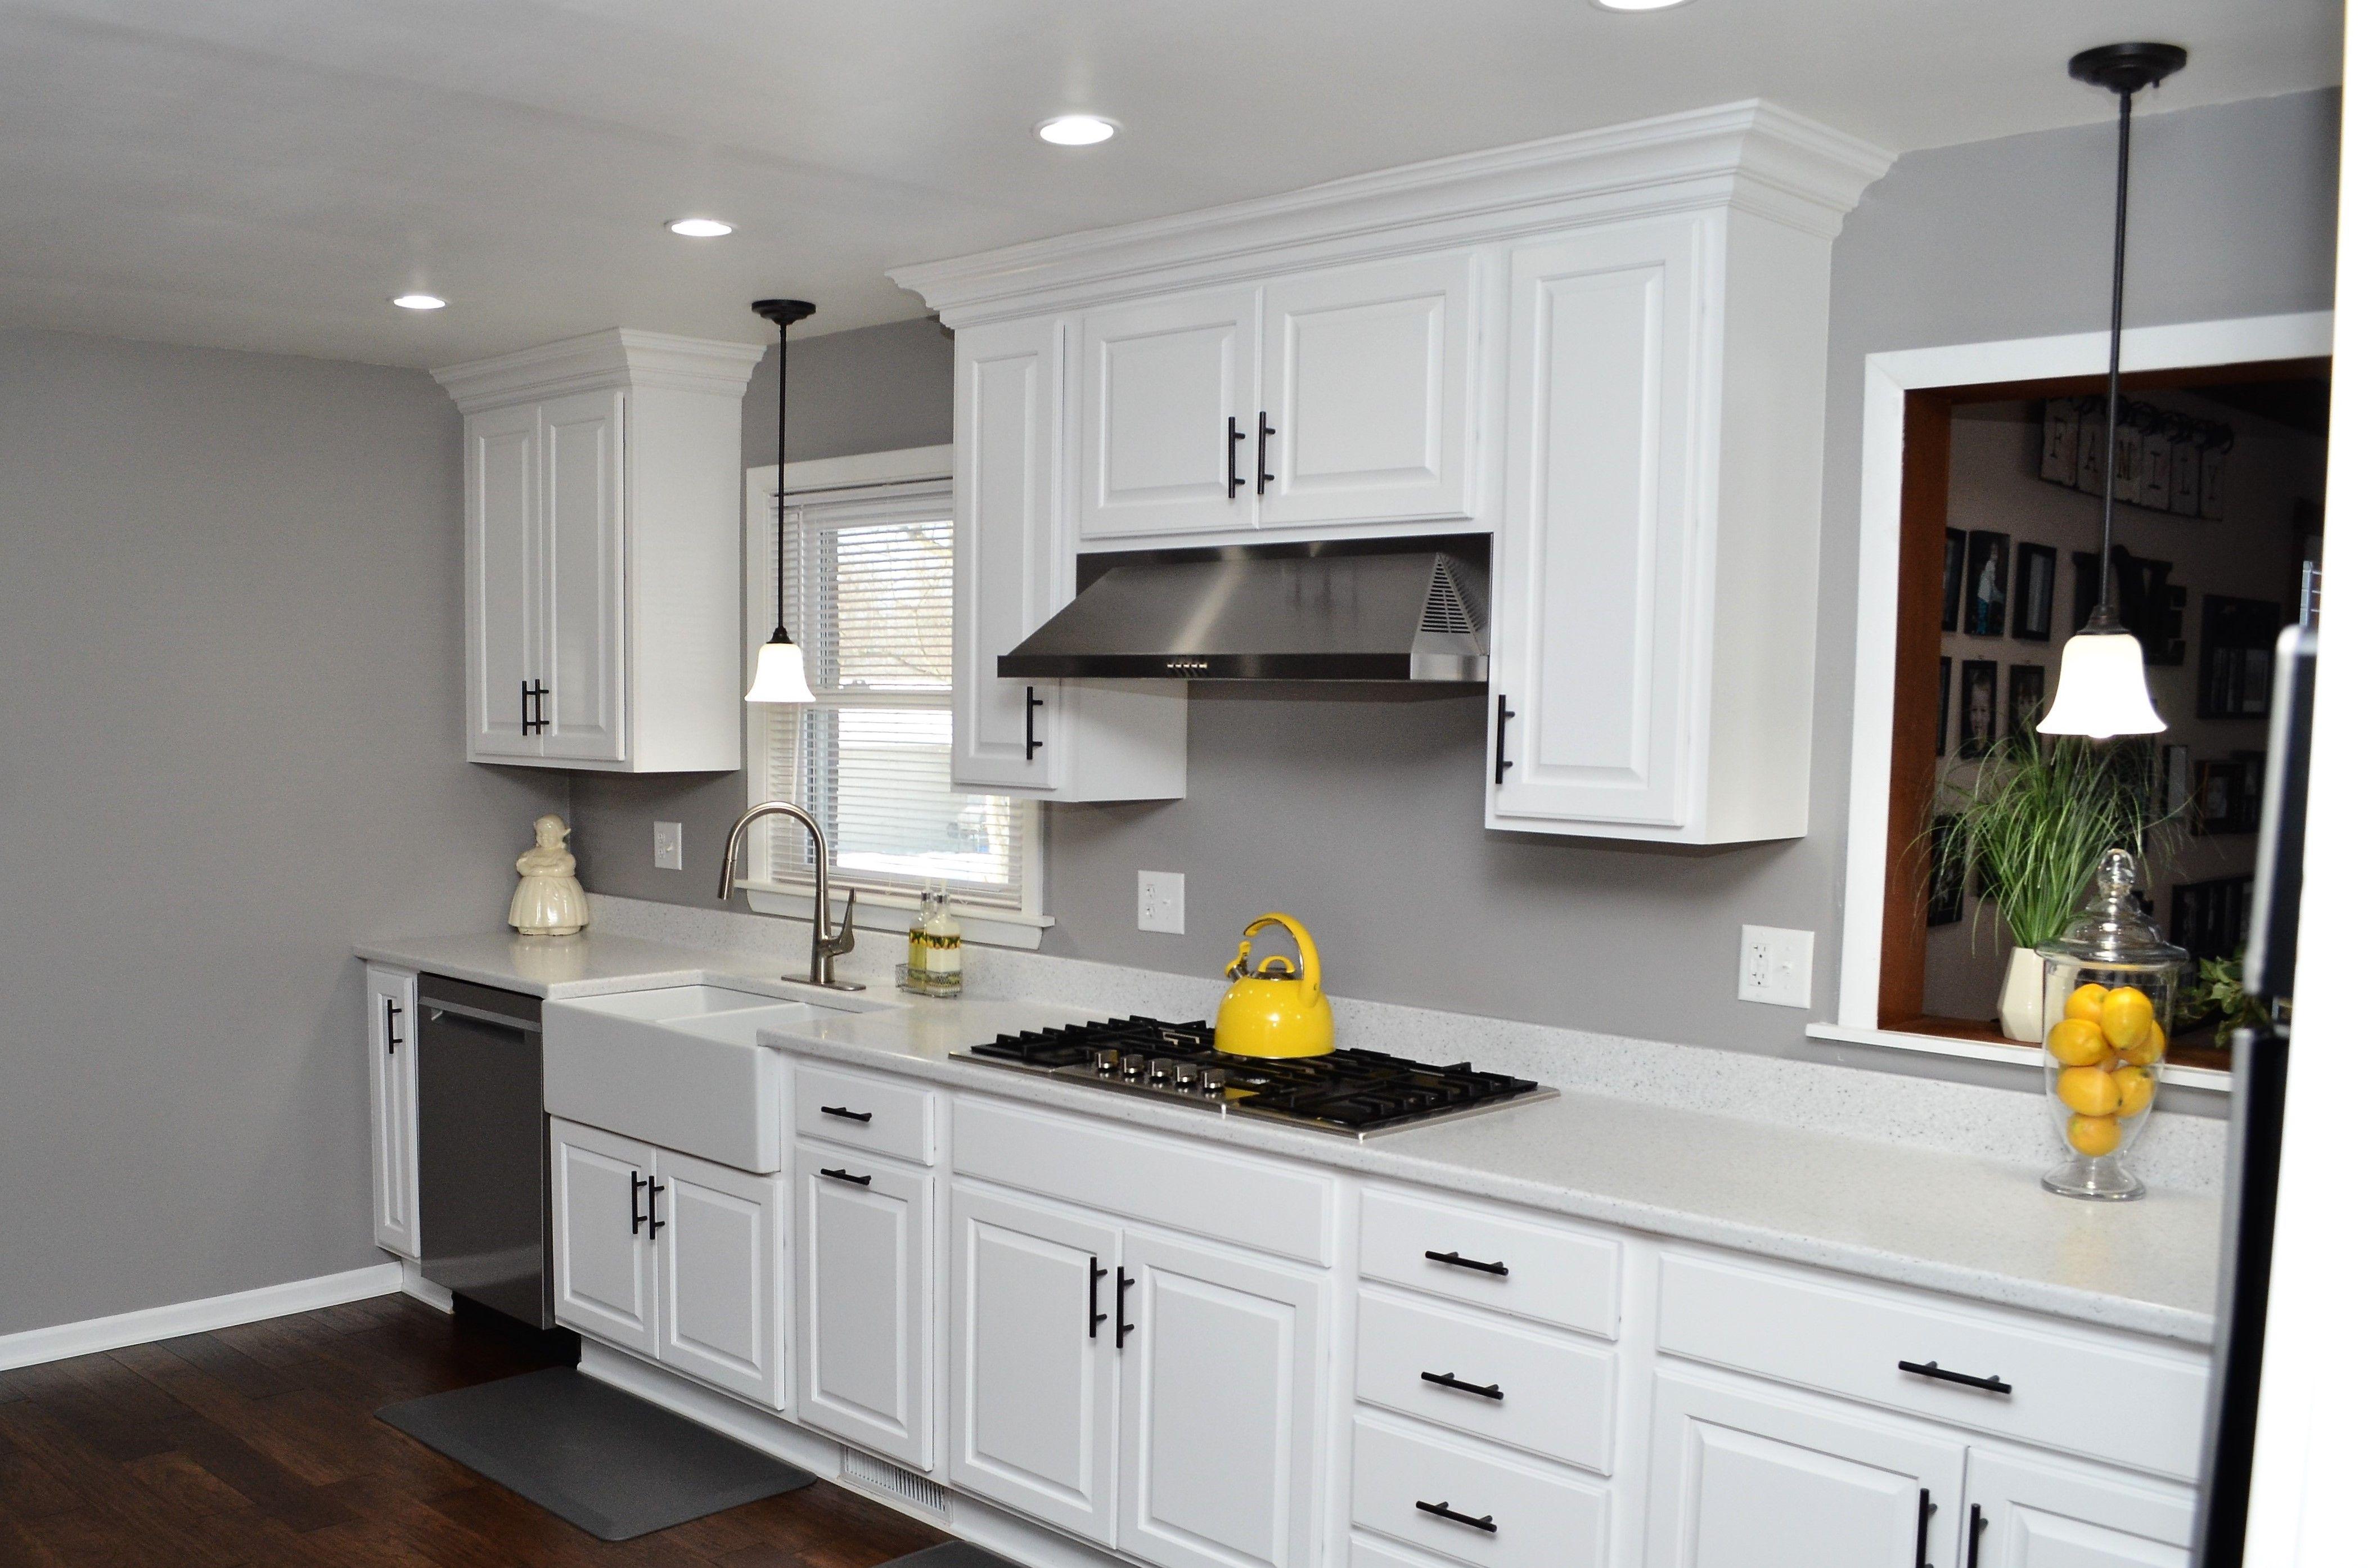 Silver Birch Color Corian Countertops Kitchen Countertops Countertop Materials